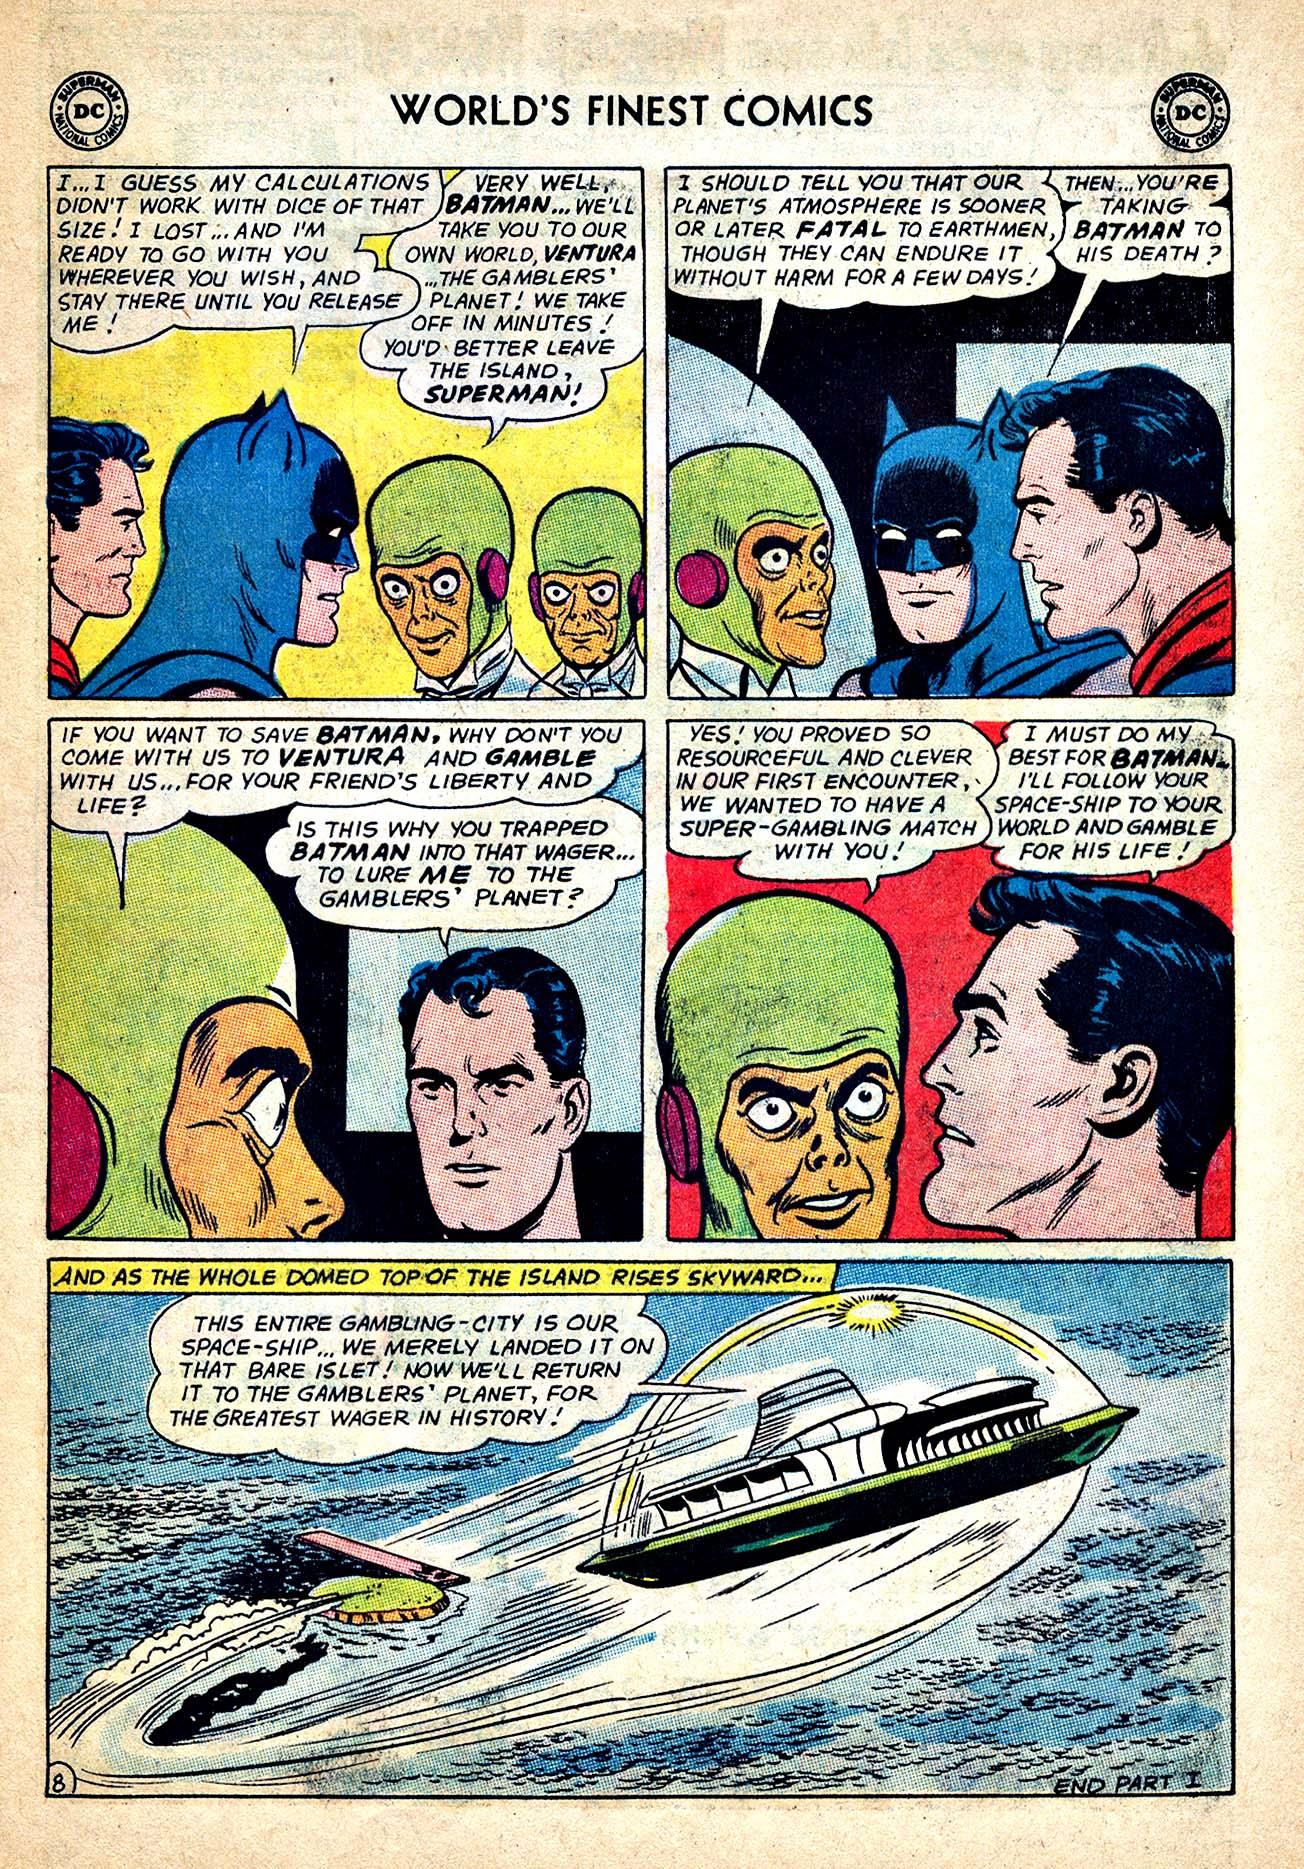 Read online World's Finest Comics comic -  Issue #150 - 11